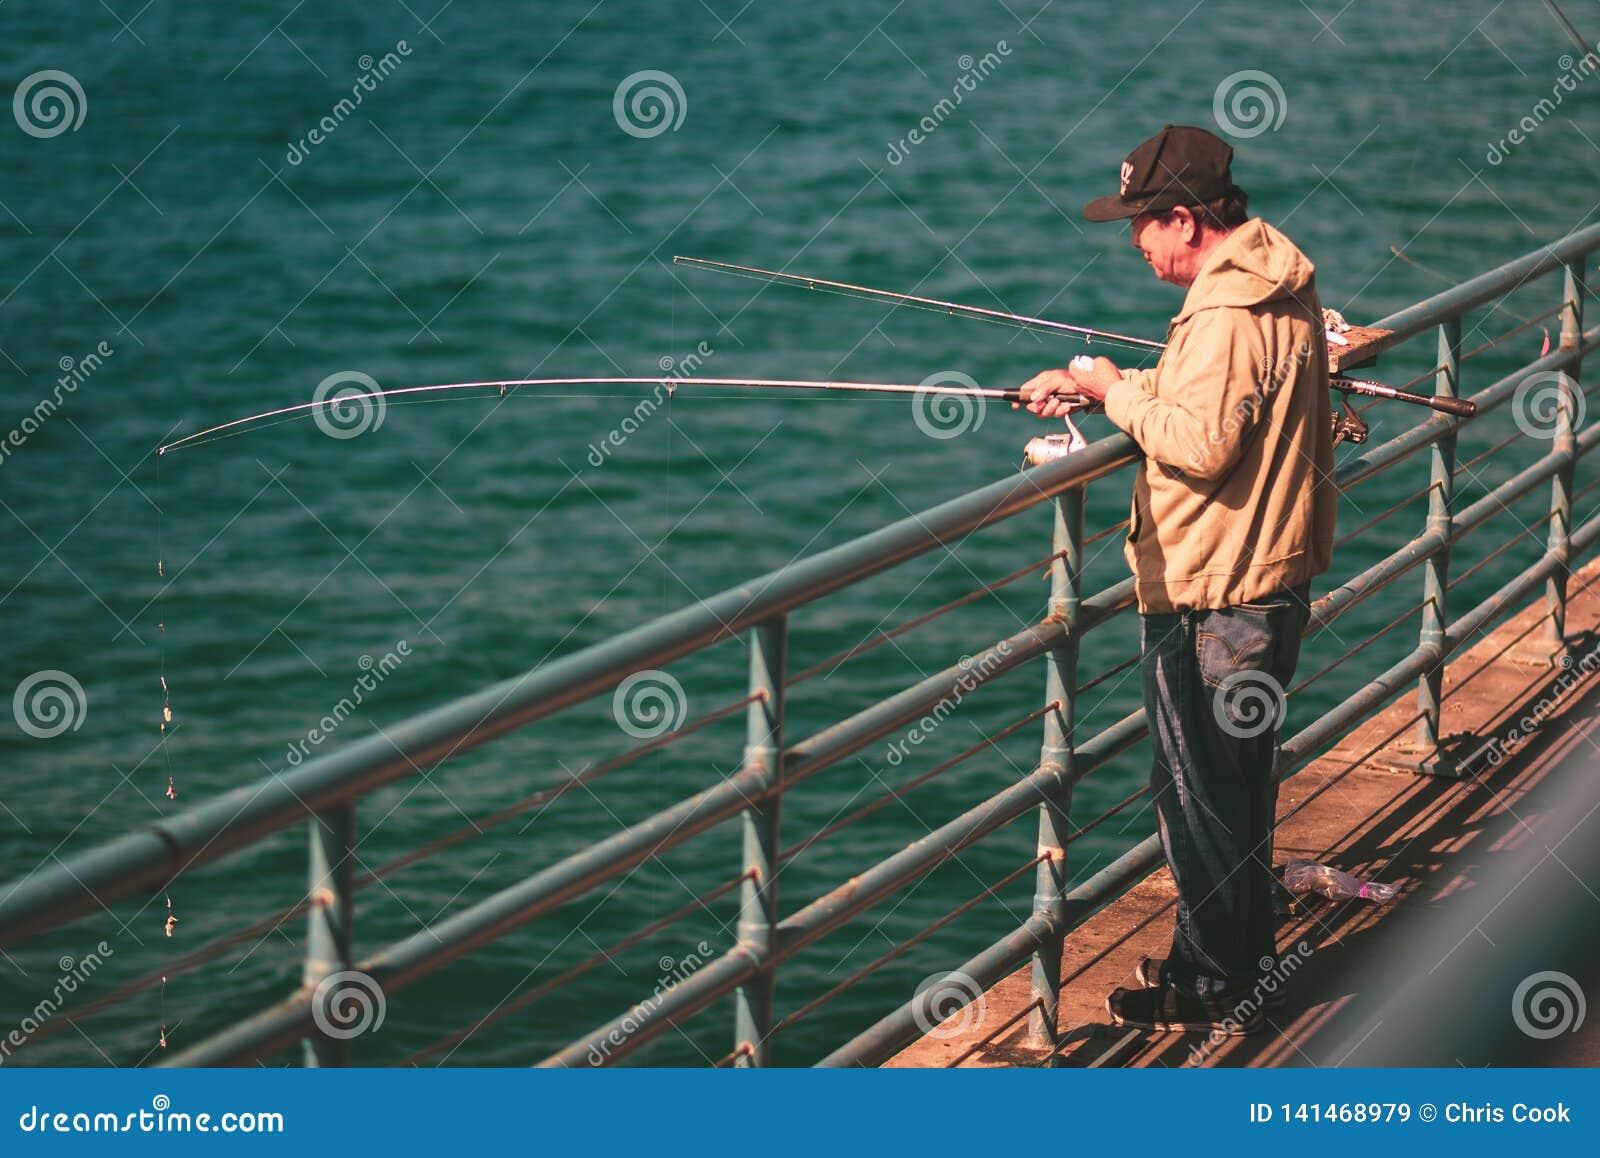 LA, USA - 30th October 2018: A fisherman on the Santa Monica Pier